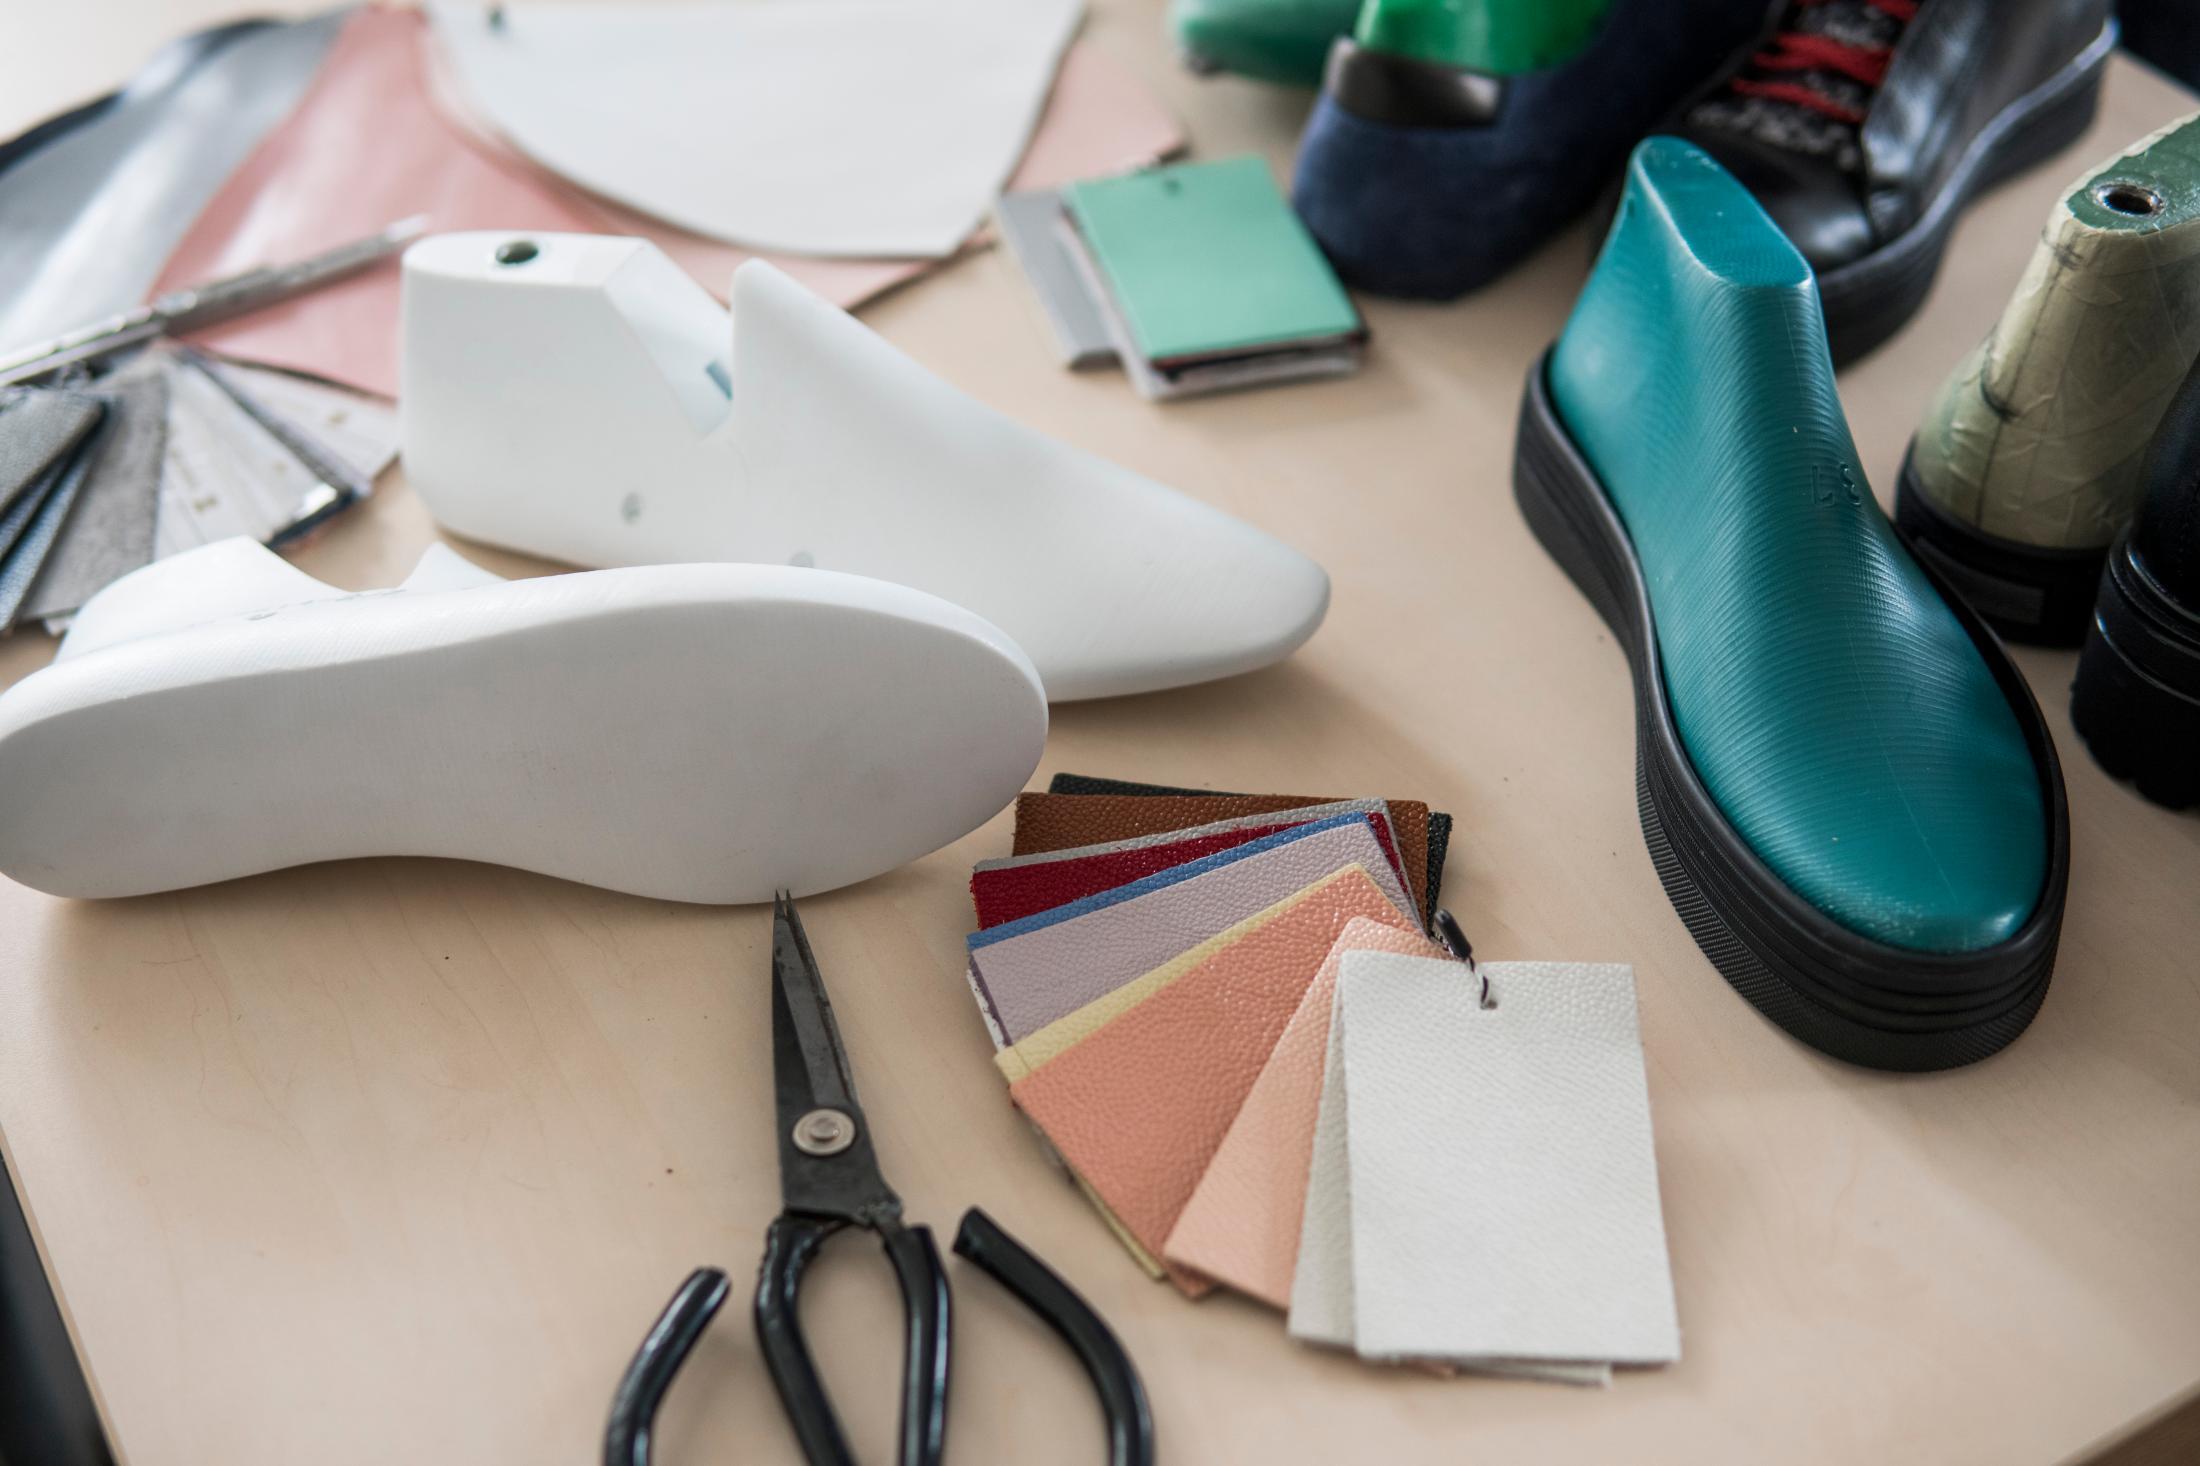 Custom Made Orthopaedic Shoes